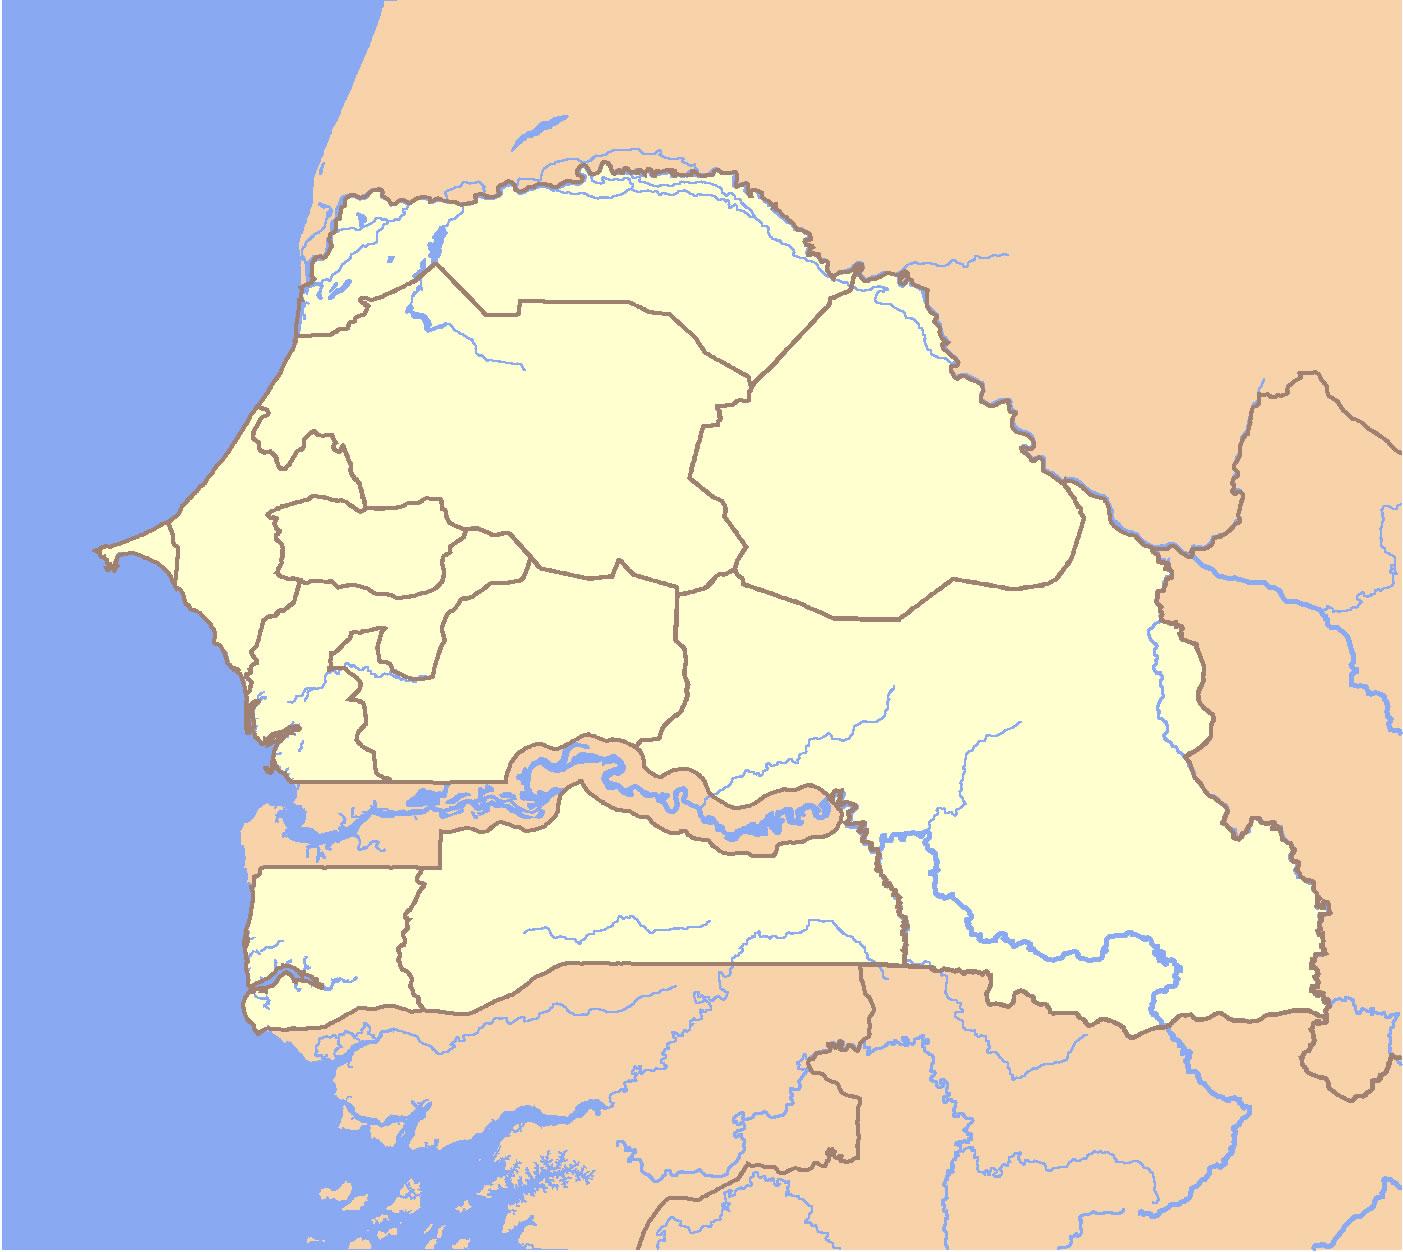 Carte Senegal Vierge.Carte Senegal Vierge Couleur Carte Vierge De Senegal En Couleur